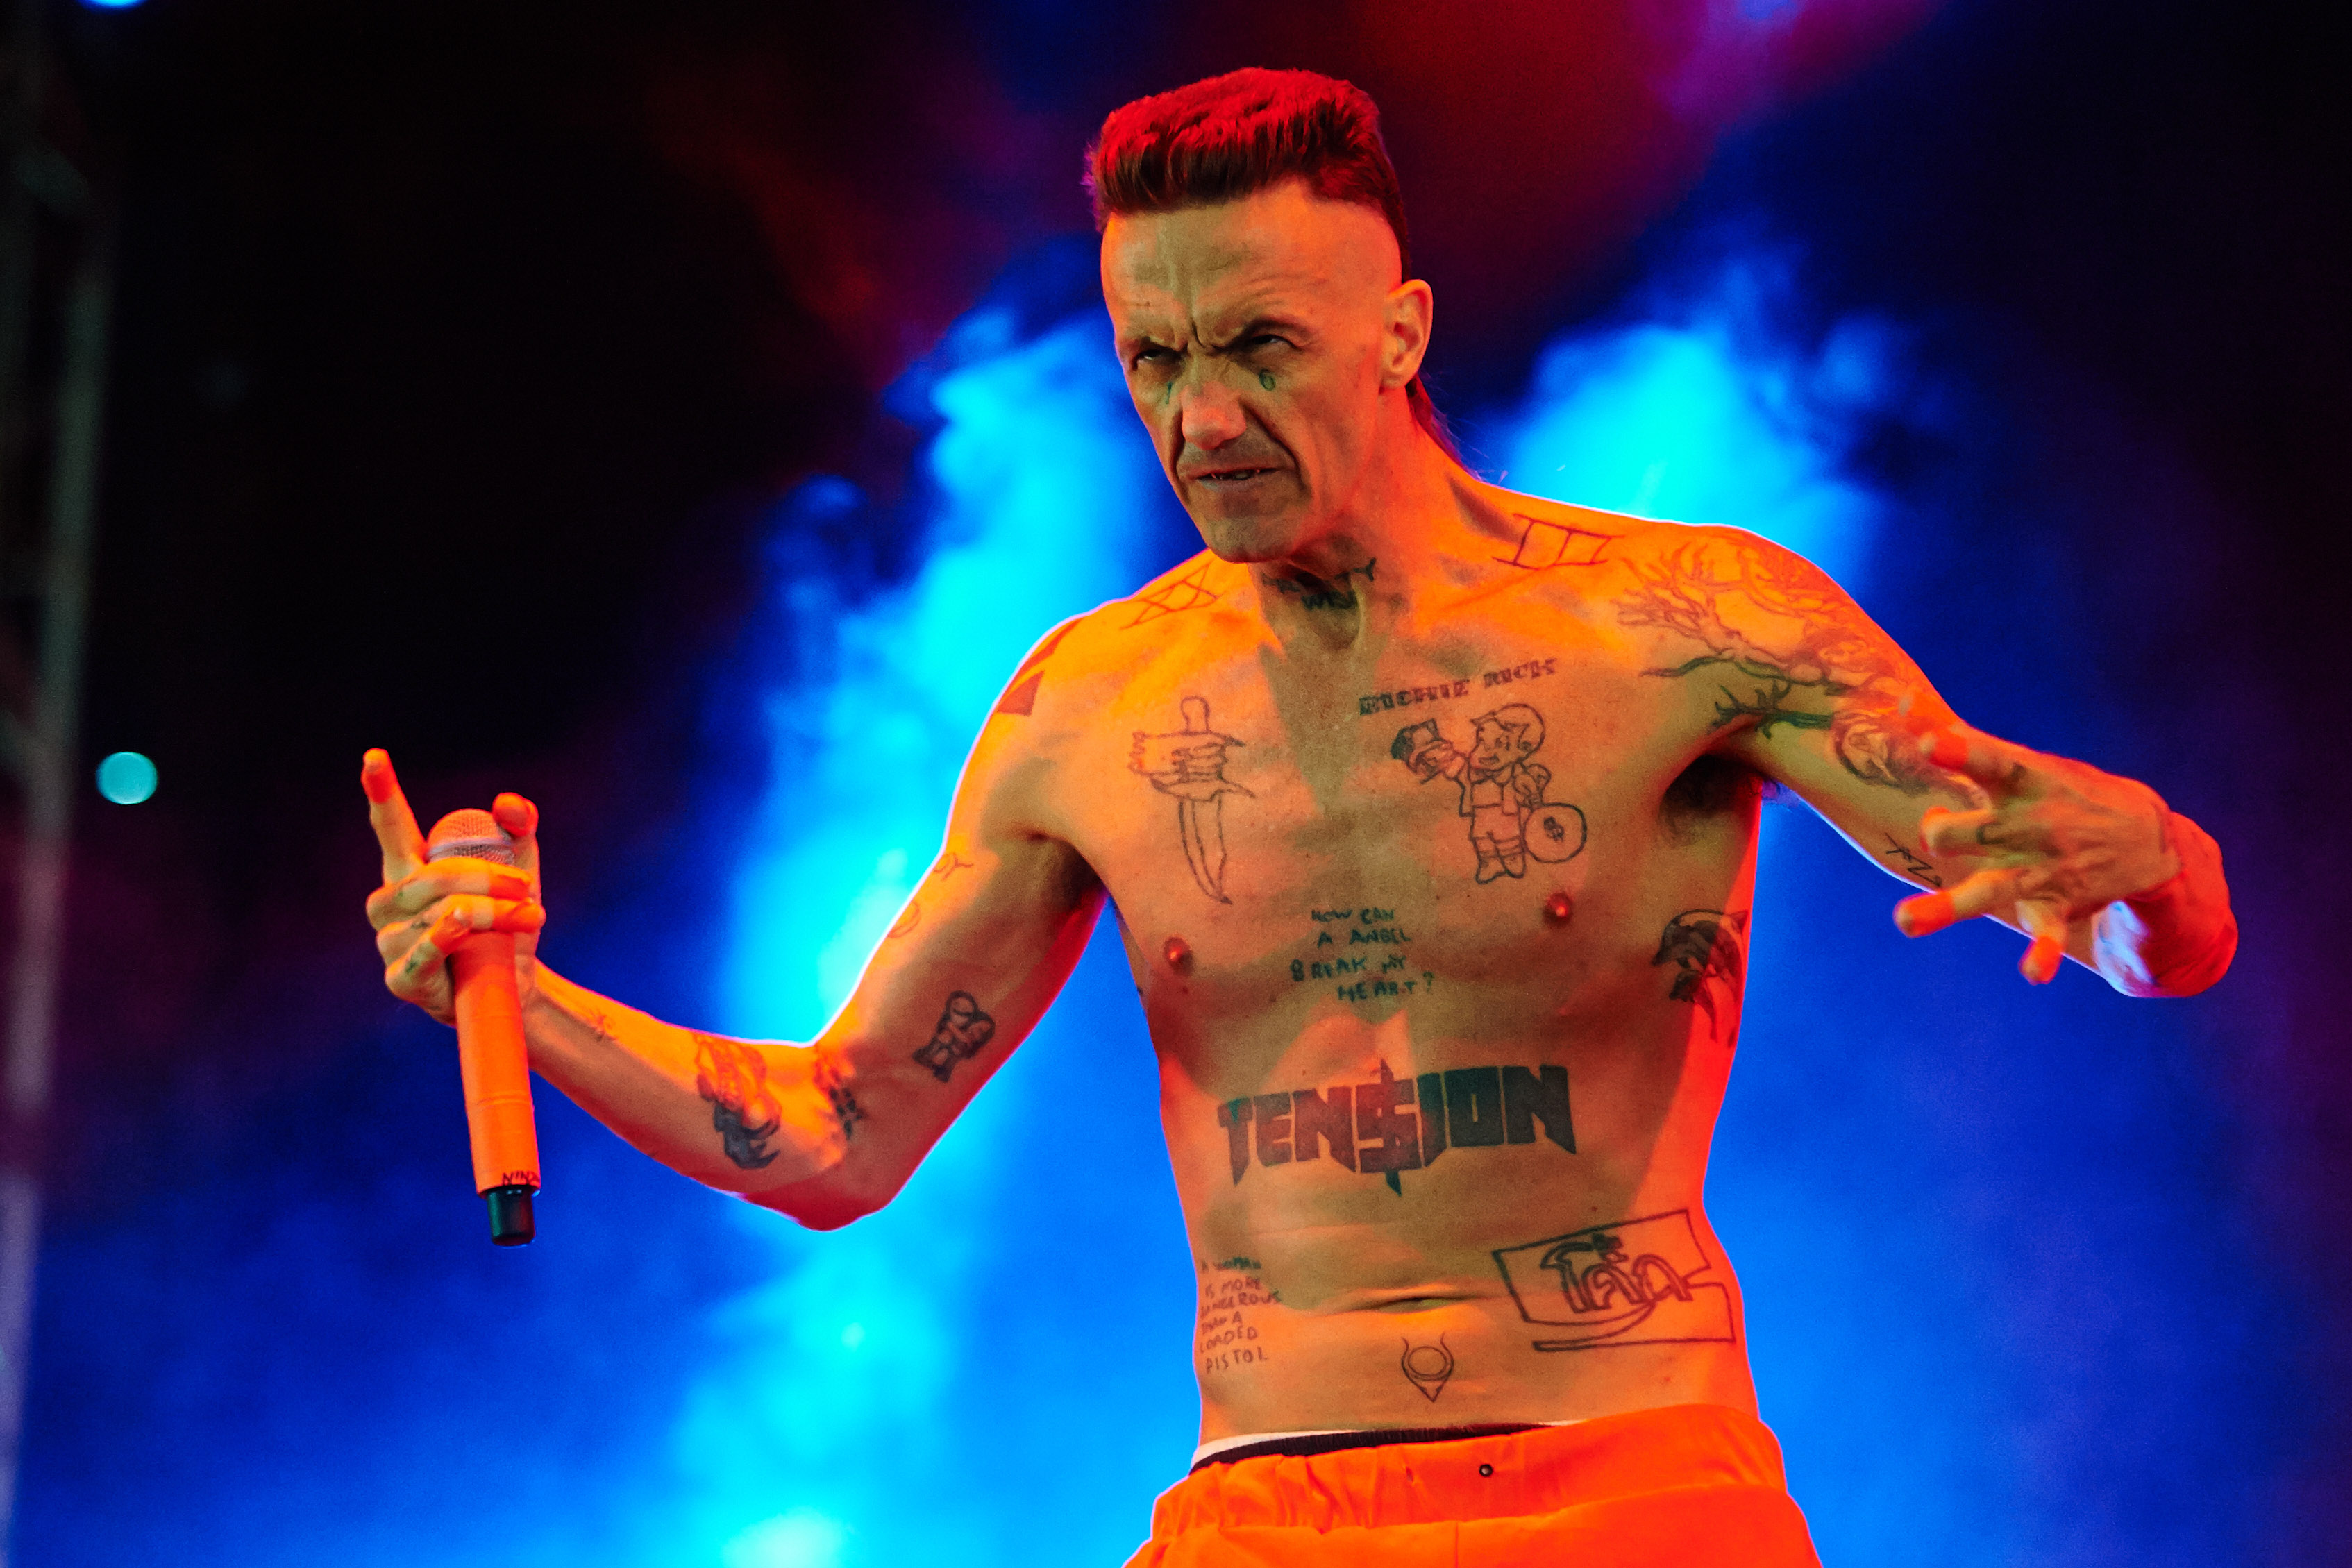 LEEDS, UNITED KINGDOM - AUGUST 24: Ninja of Die Antwoord performs on stage at Leeds Festival at Bramham Park on August 24, 20